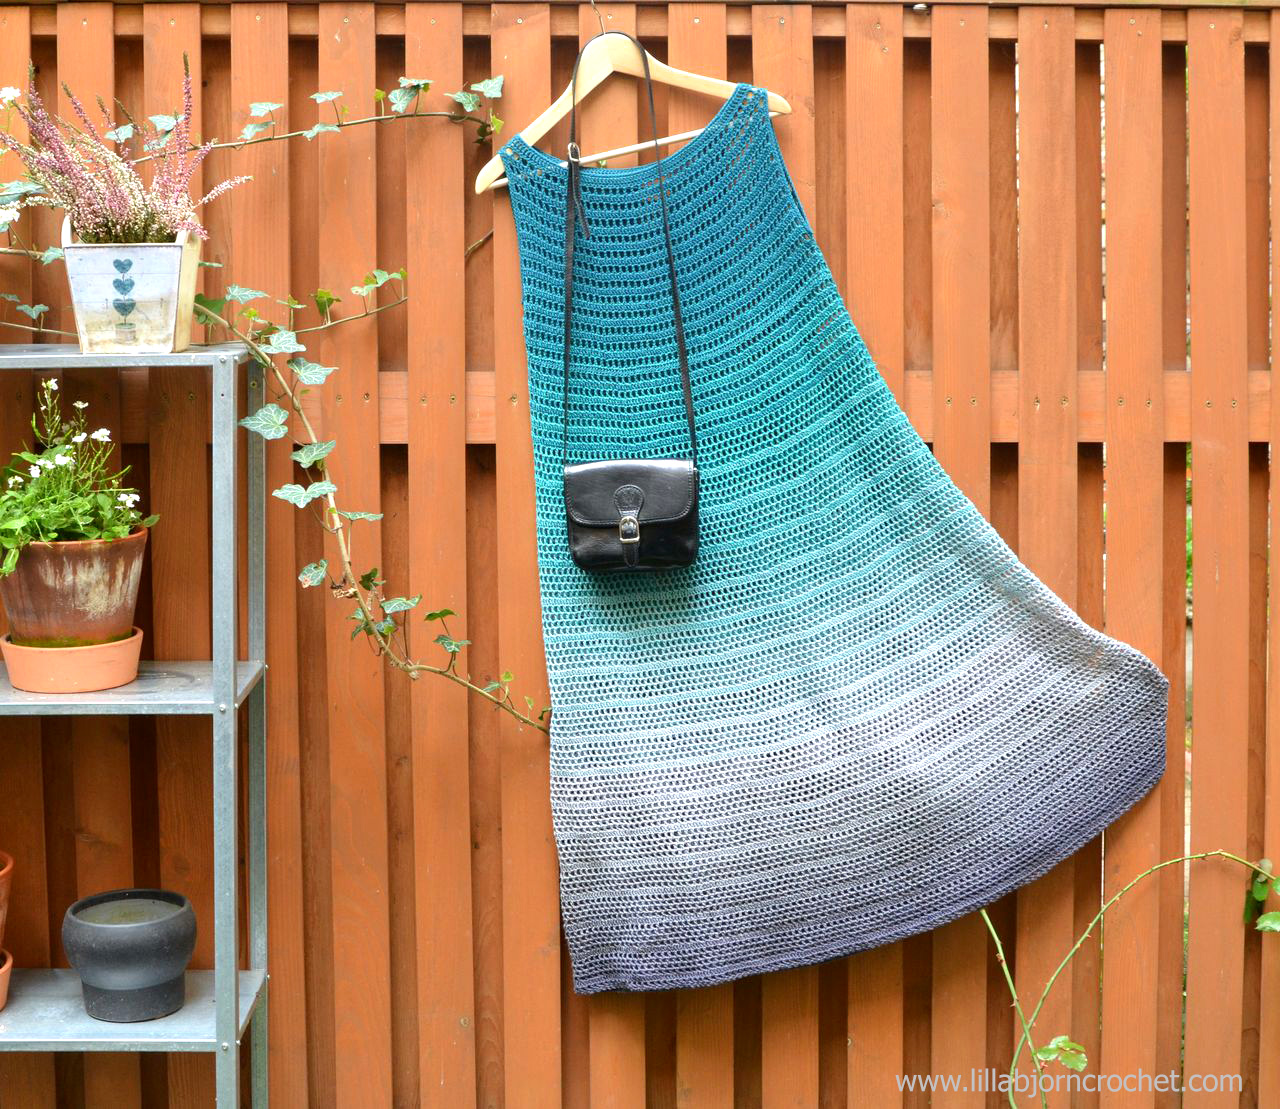 Whirl crochet dress - designed by Lilla Bjorn